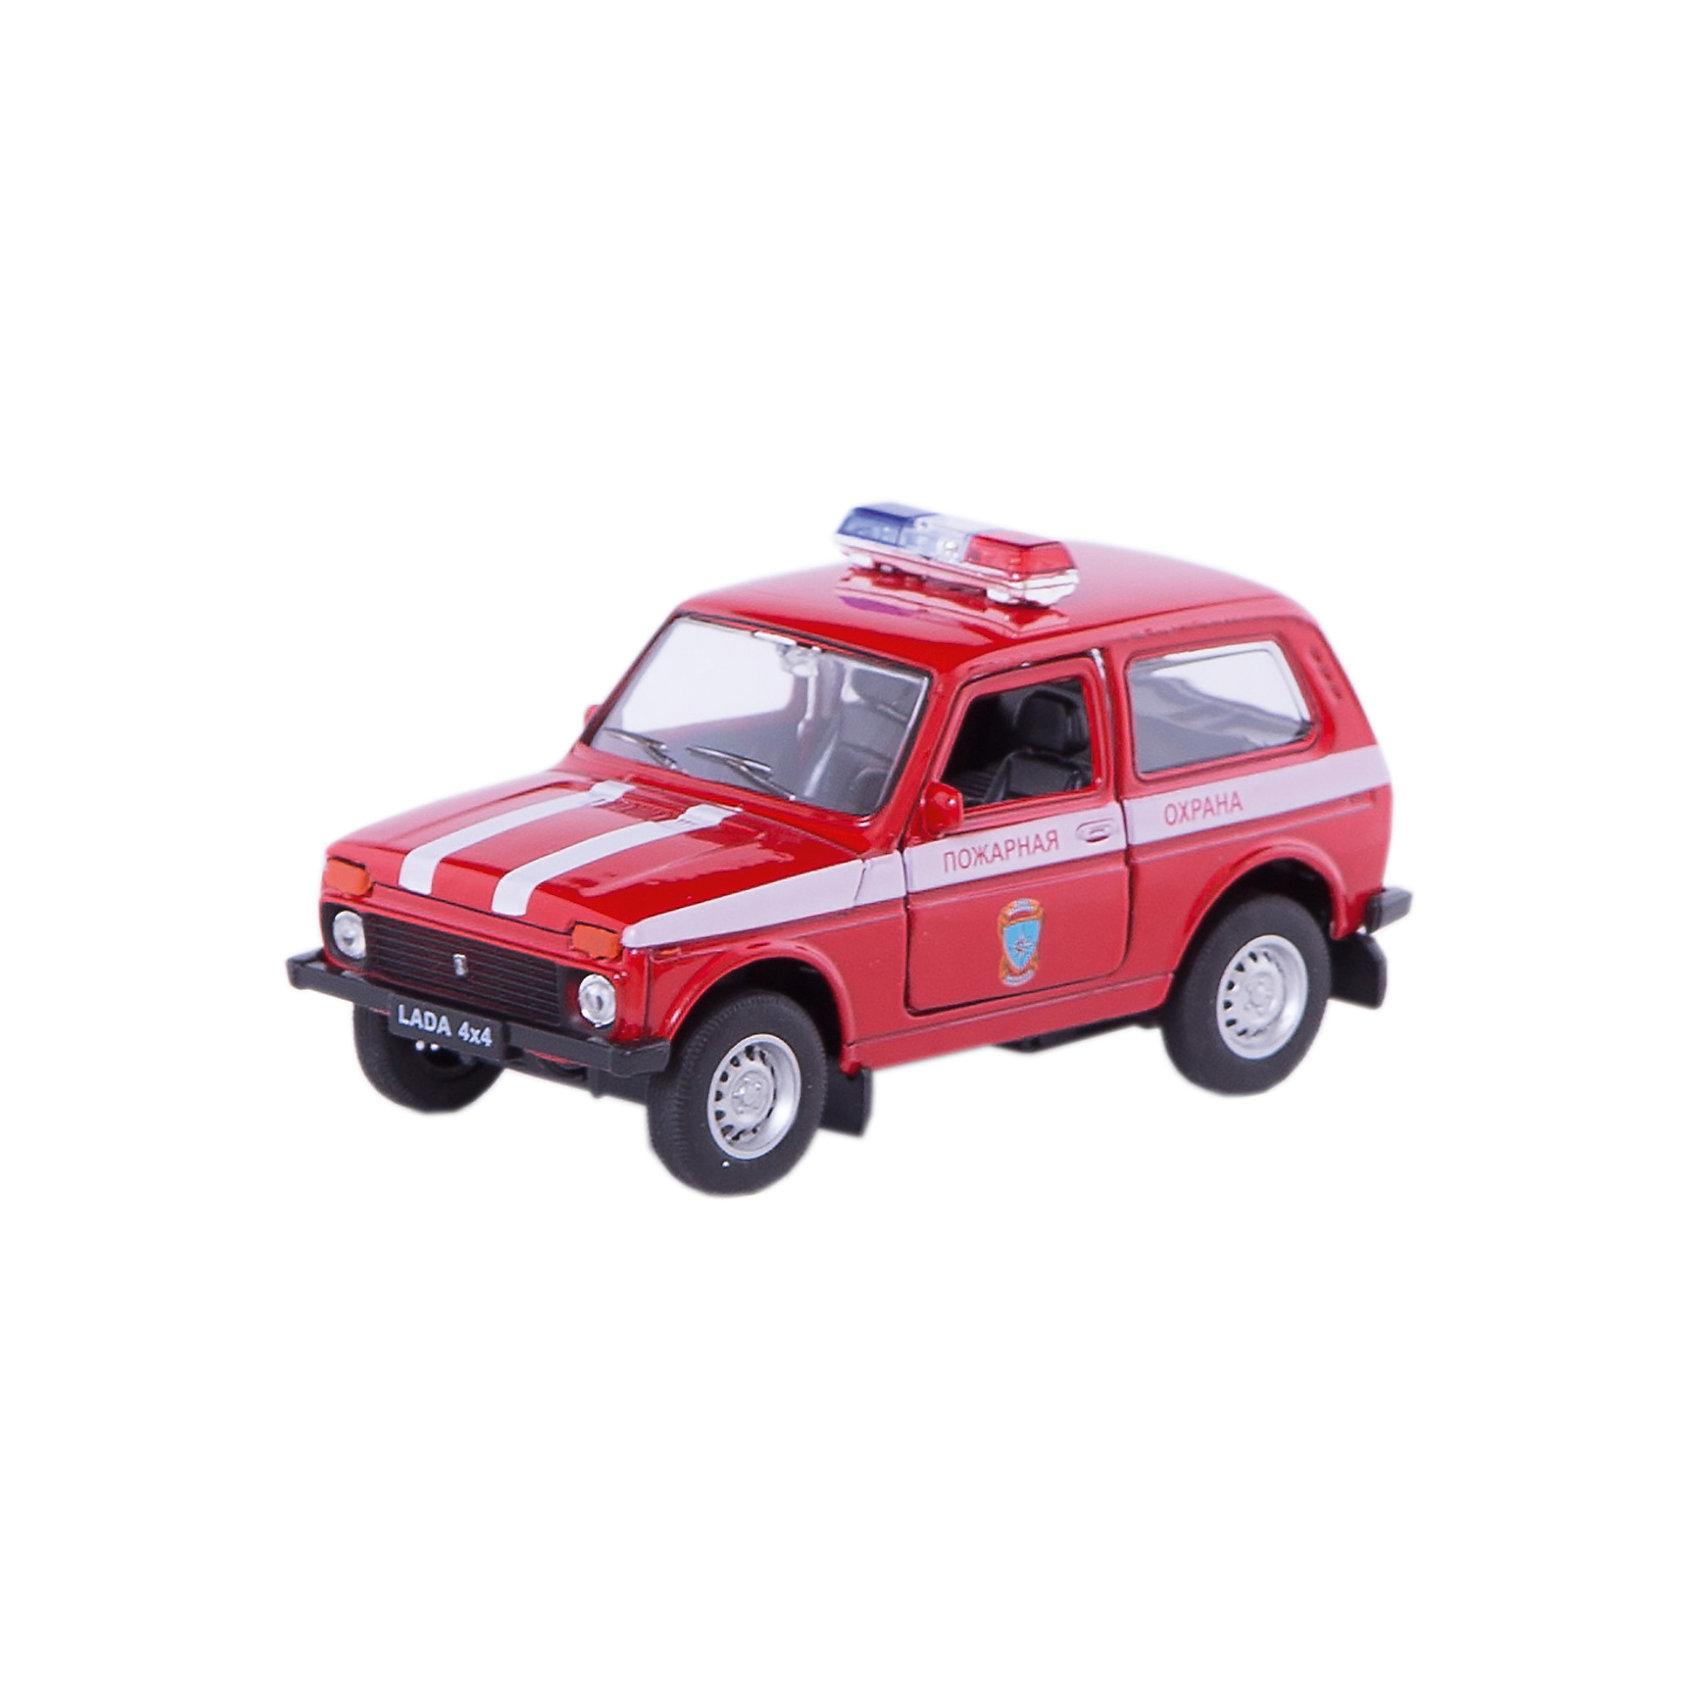 Welly Welly Модель машины 1:34-39 LADA Пожарная охрана welly welly модель машины газель пожарная охрана